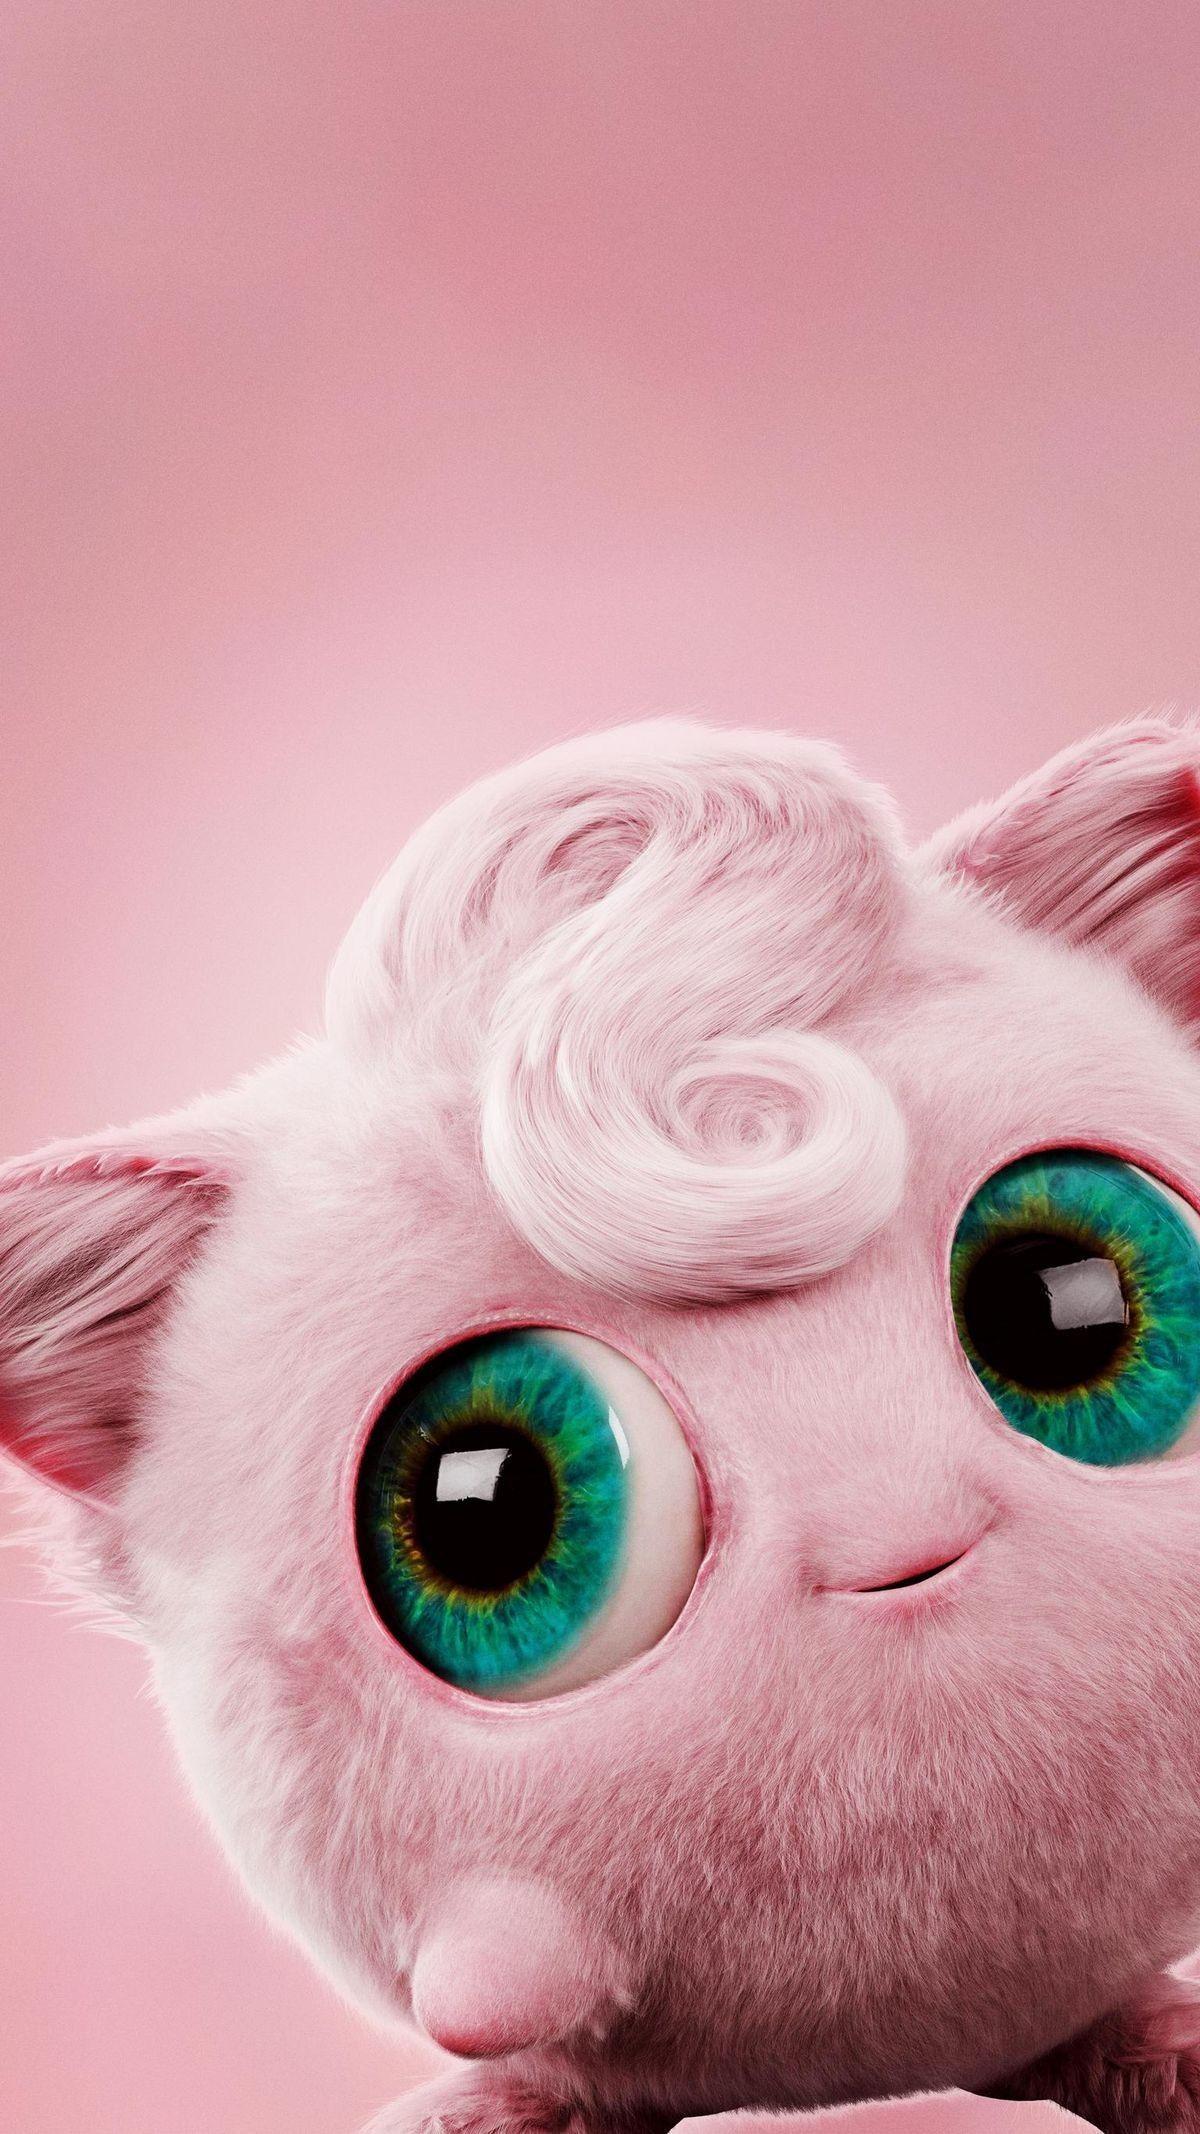 Pin By Sonu Jssr On O Wallpaper Iphone Cute Cute Disney Wallpaper Hd Cool Wallpapers